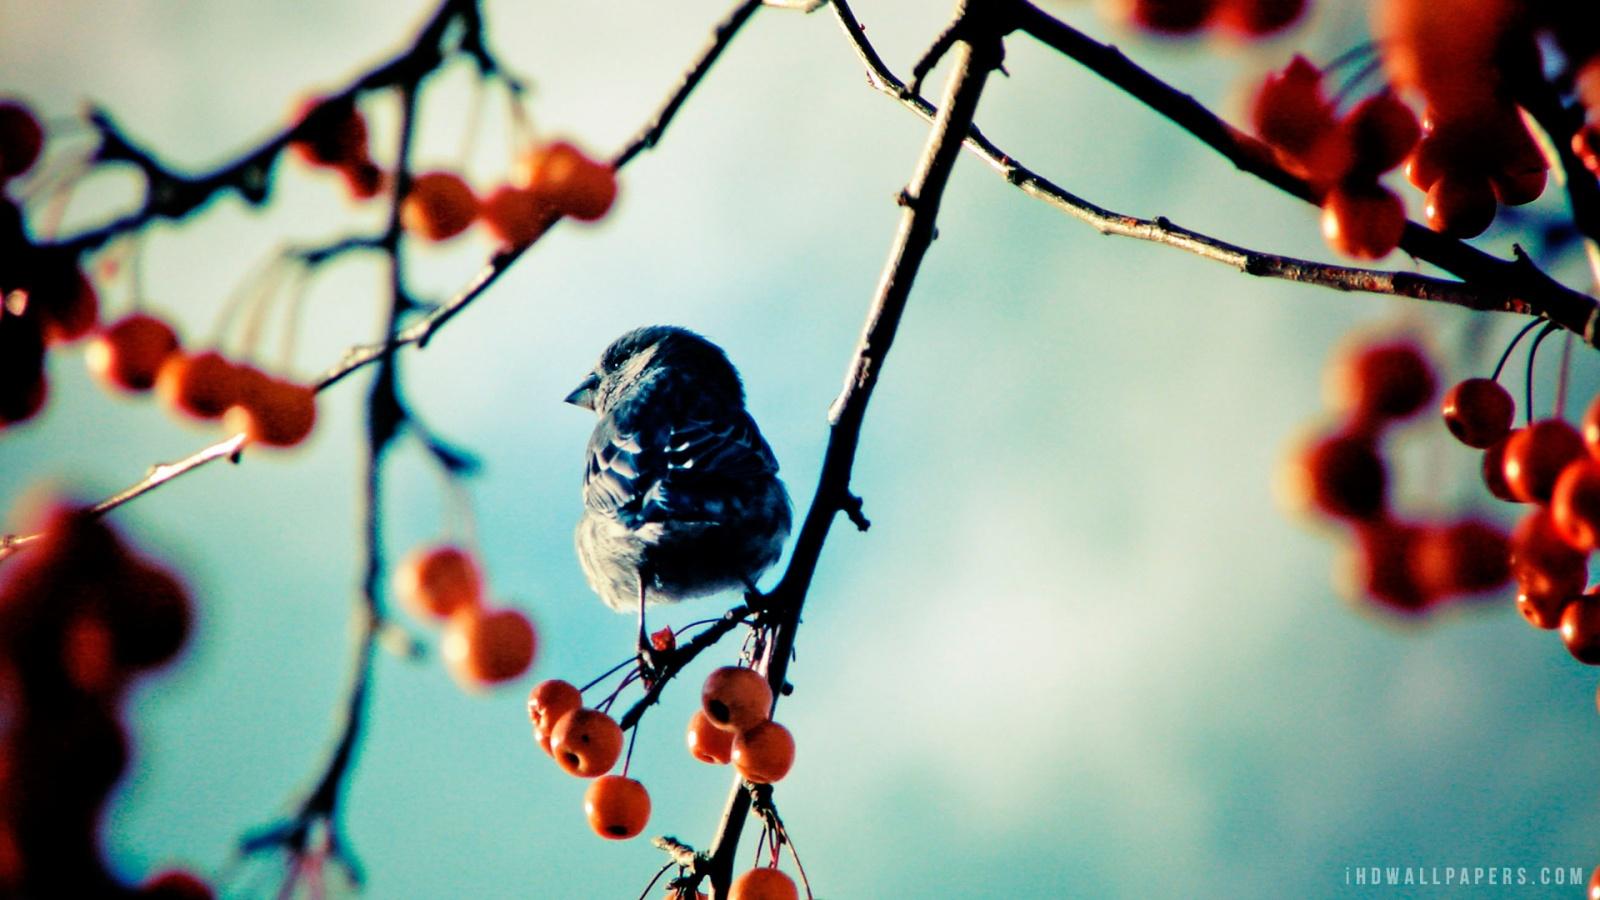 Bird on Branch HD Wallpaper   iHD Wallpapers 1600x900